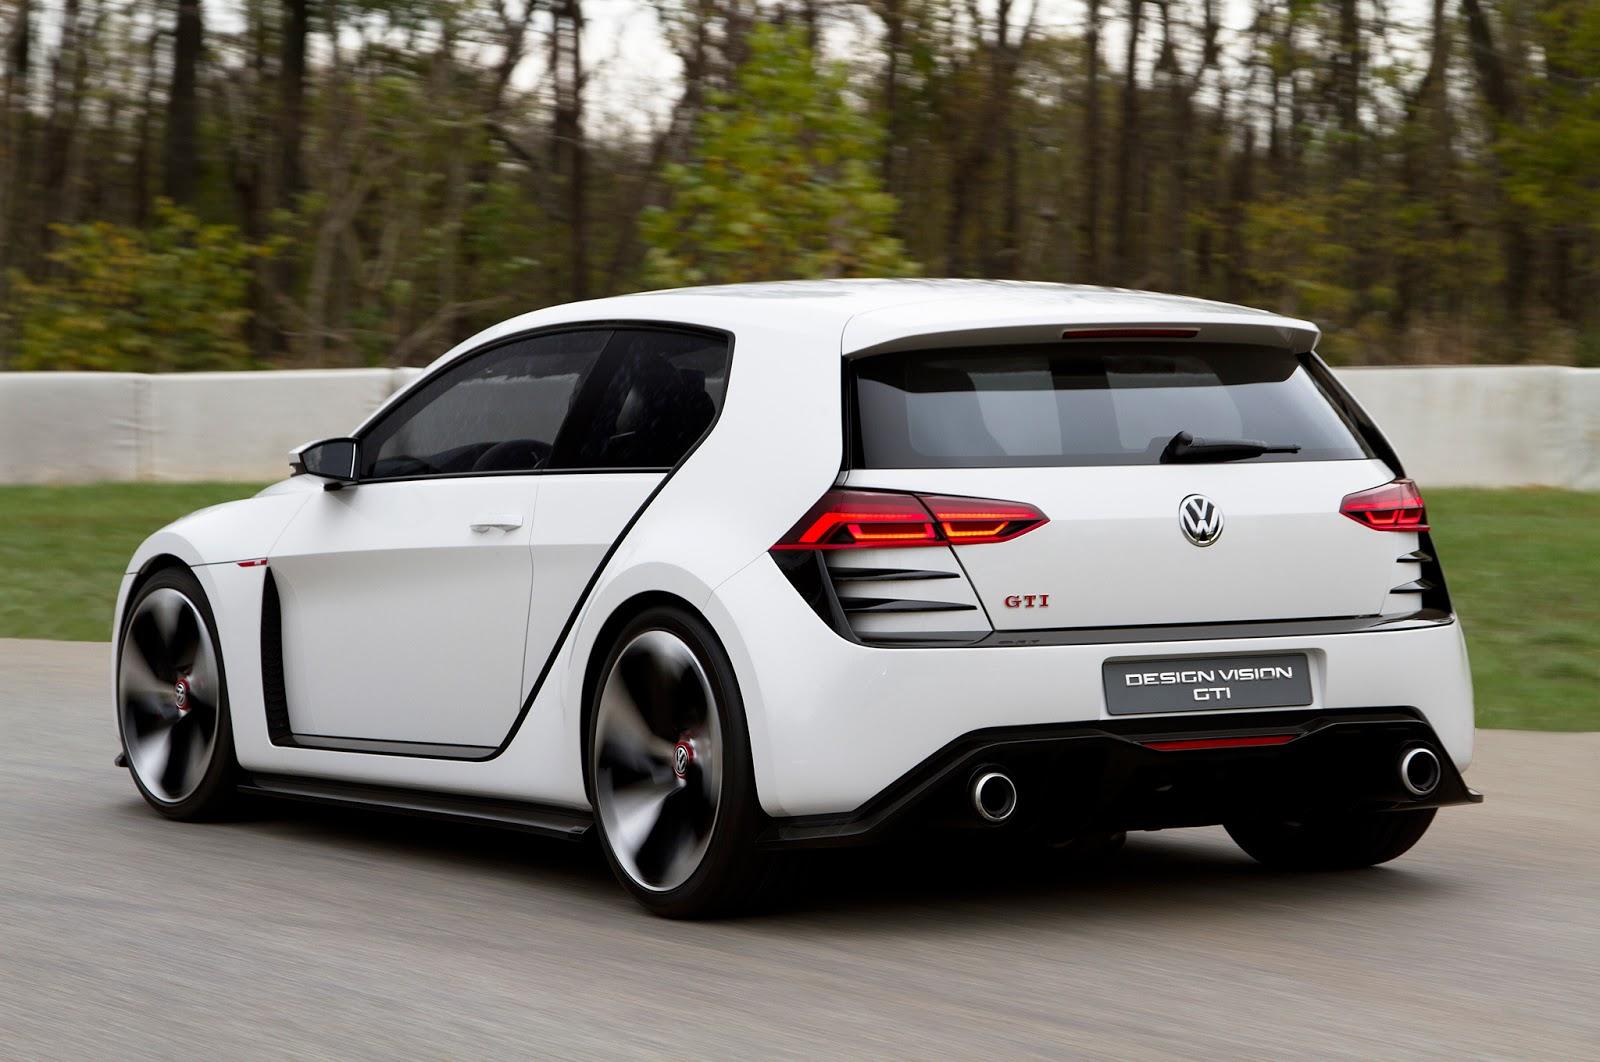 VW Design Vision GTI Concept 011 Η όγδοη γενιά του Golf θα έχει τετρακίνηση και 400 άλογα Golf R400, Volkswagen, VW, VW Golf GTI, zblog